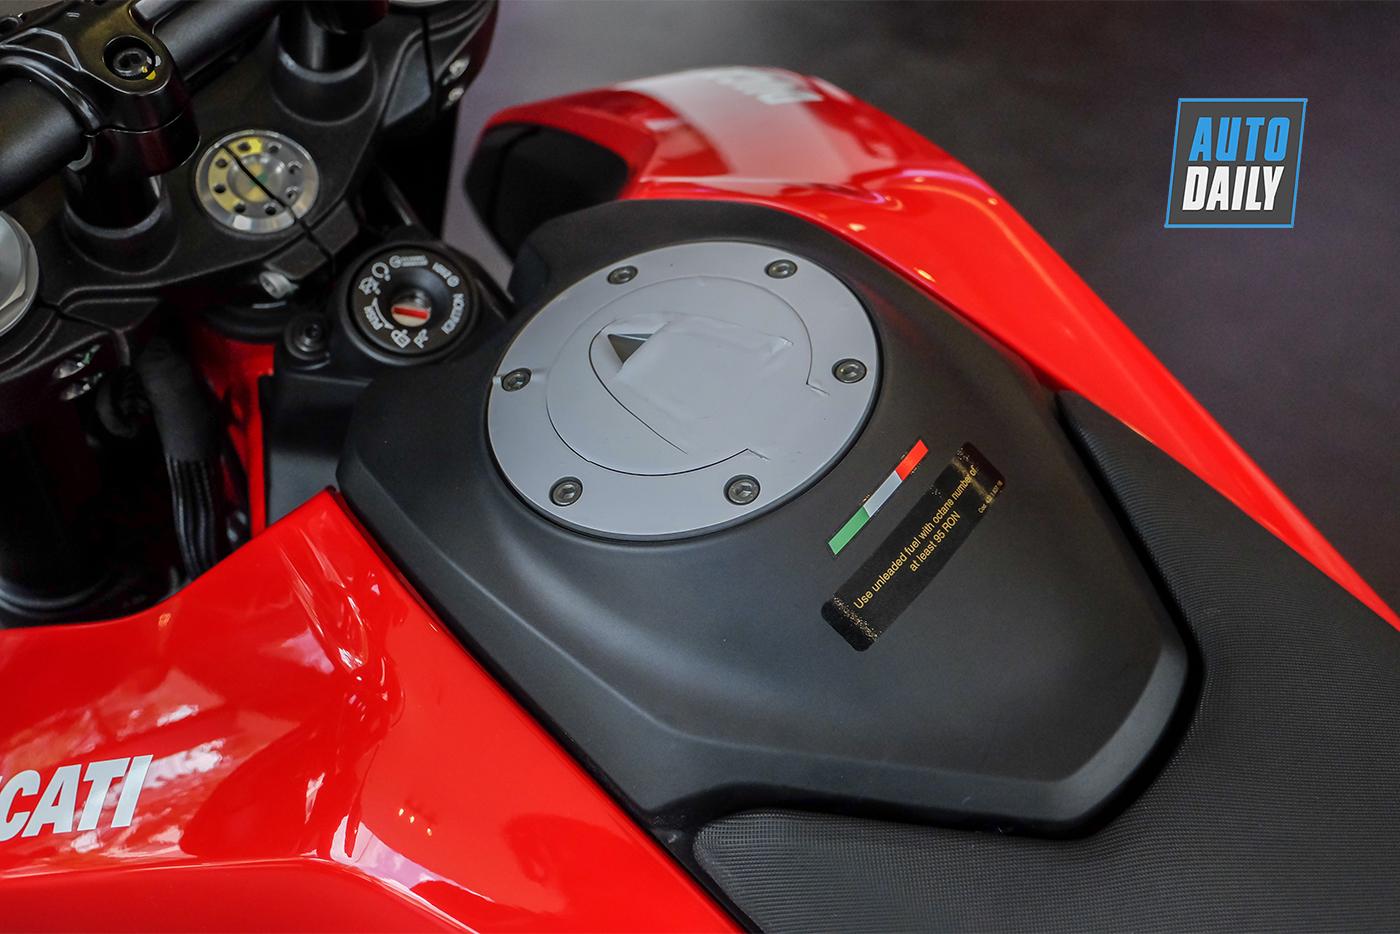 ducati-hypermotard-950-2019-93.jpg